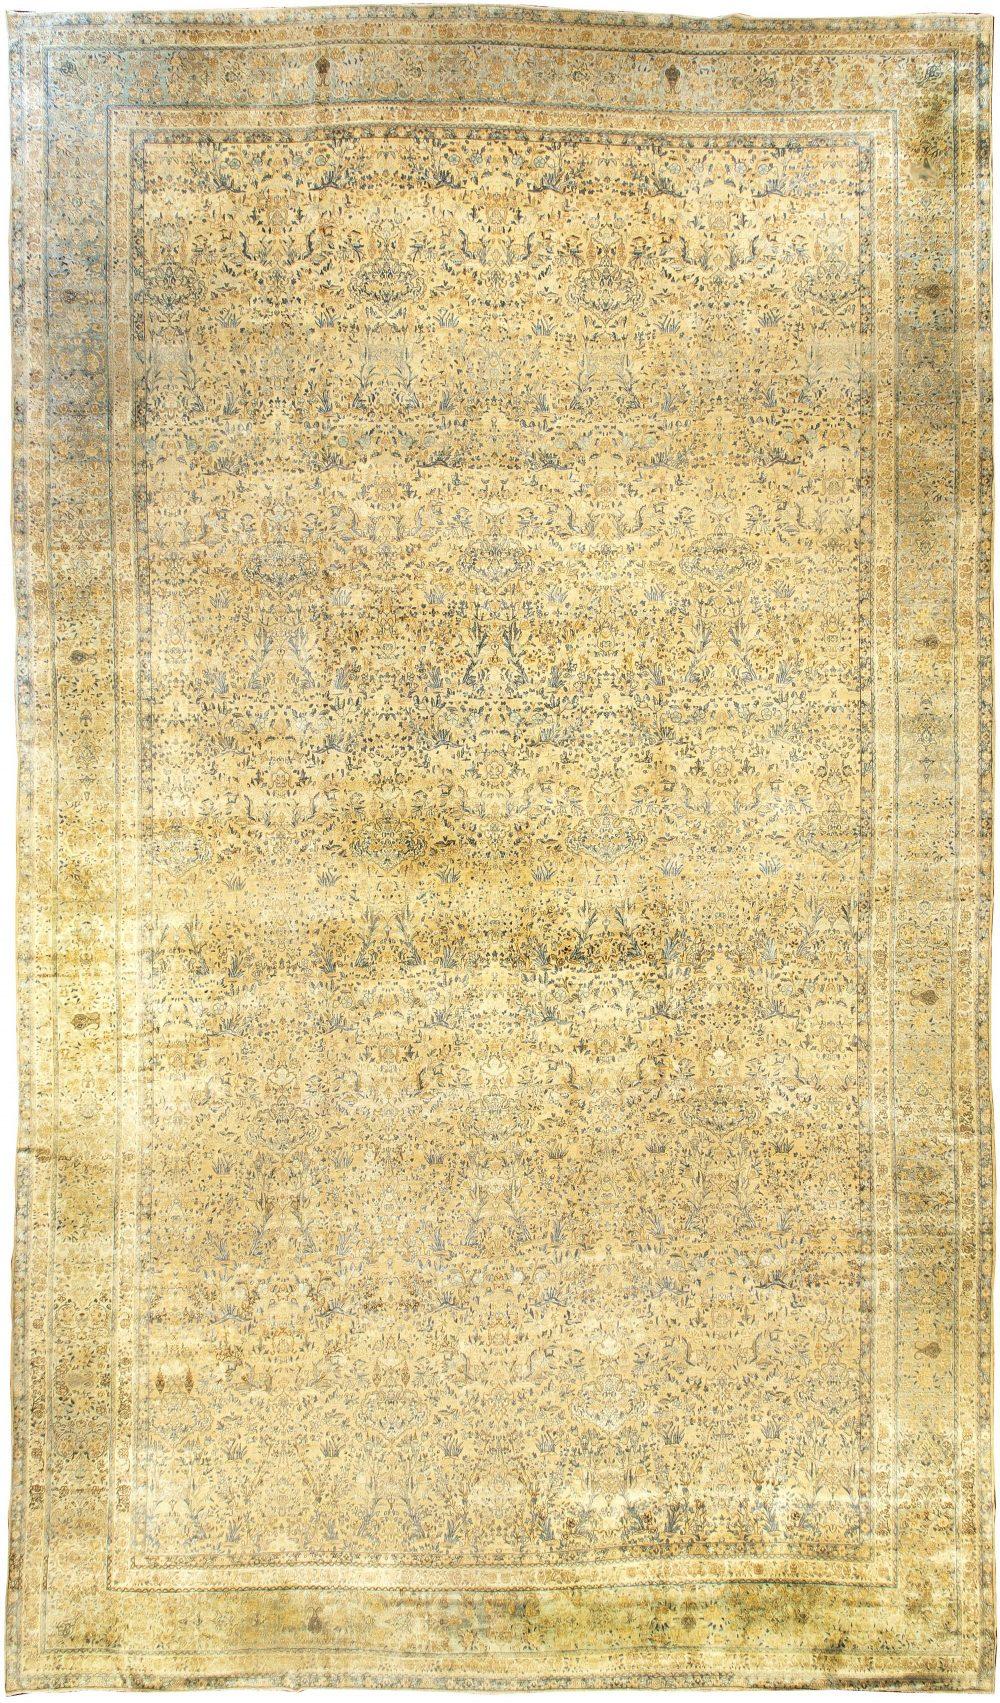 Antique Persian Kirman Carpet BB3477